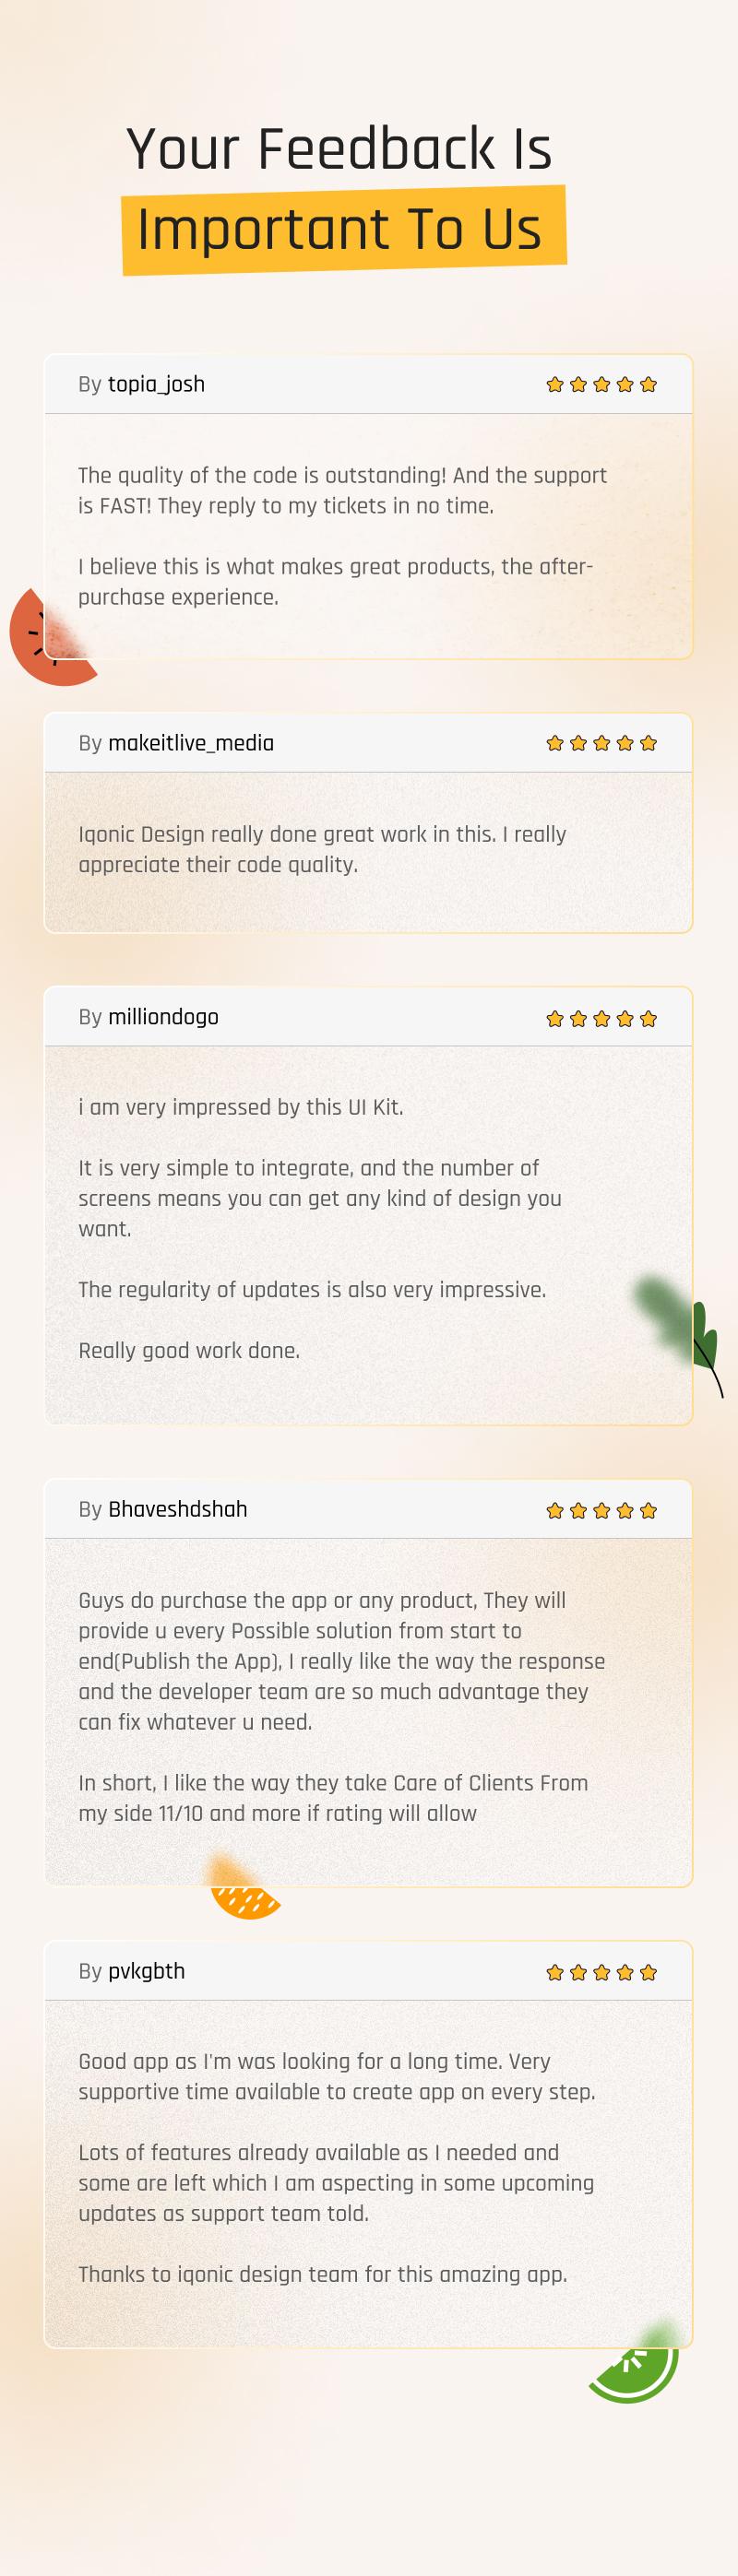 Flutter Recipe App with Laravel Backend | Ricetta | Iqonic Design flutter recipe app with laravel backend Ricetta 19